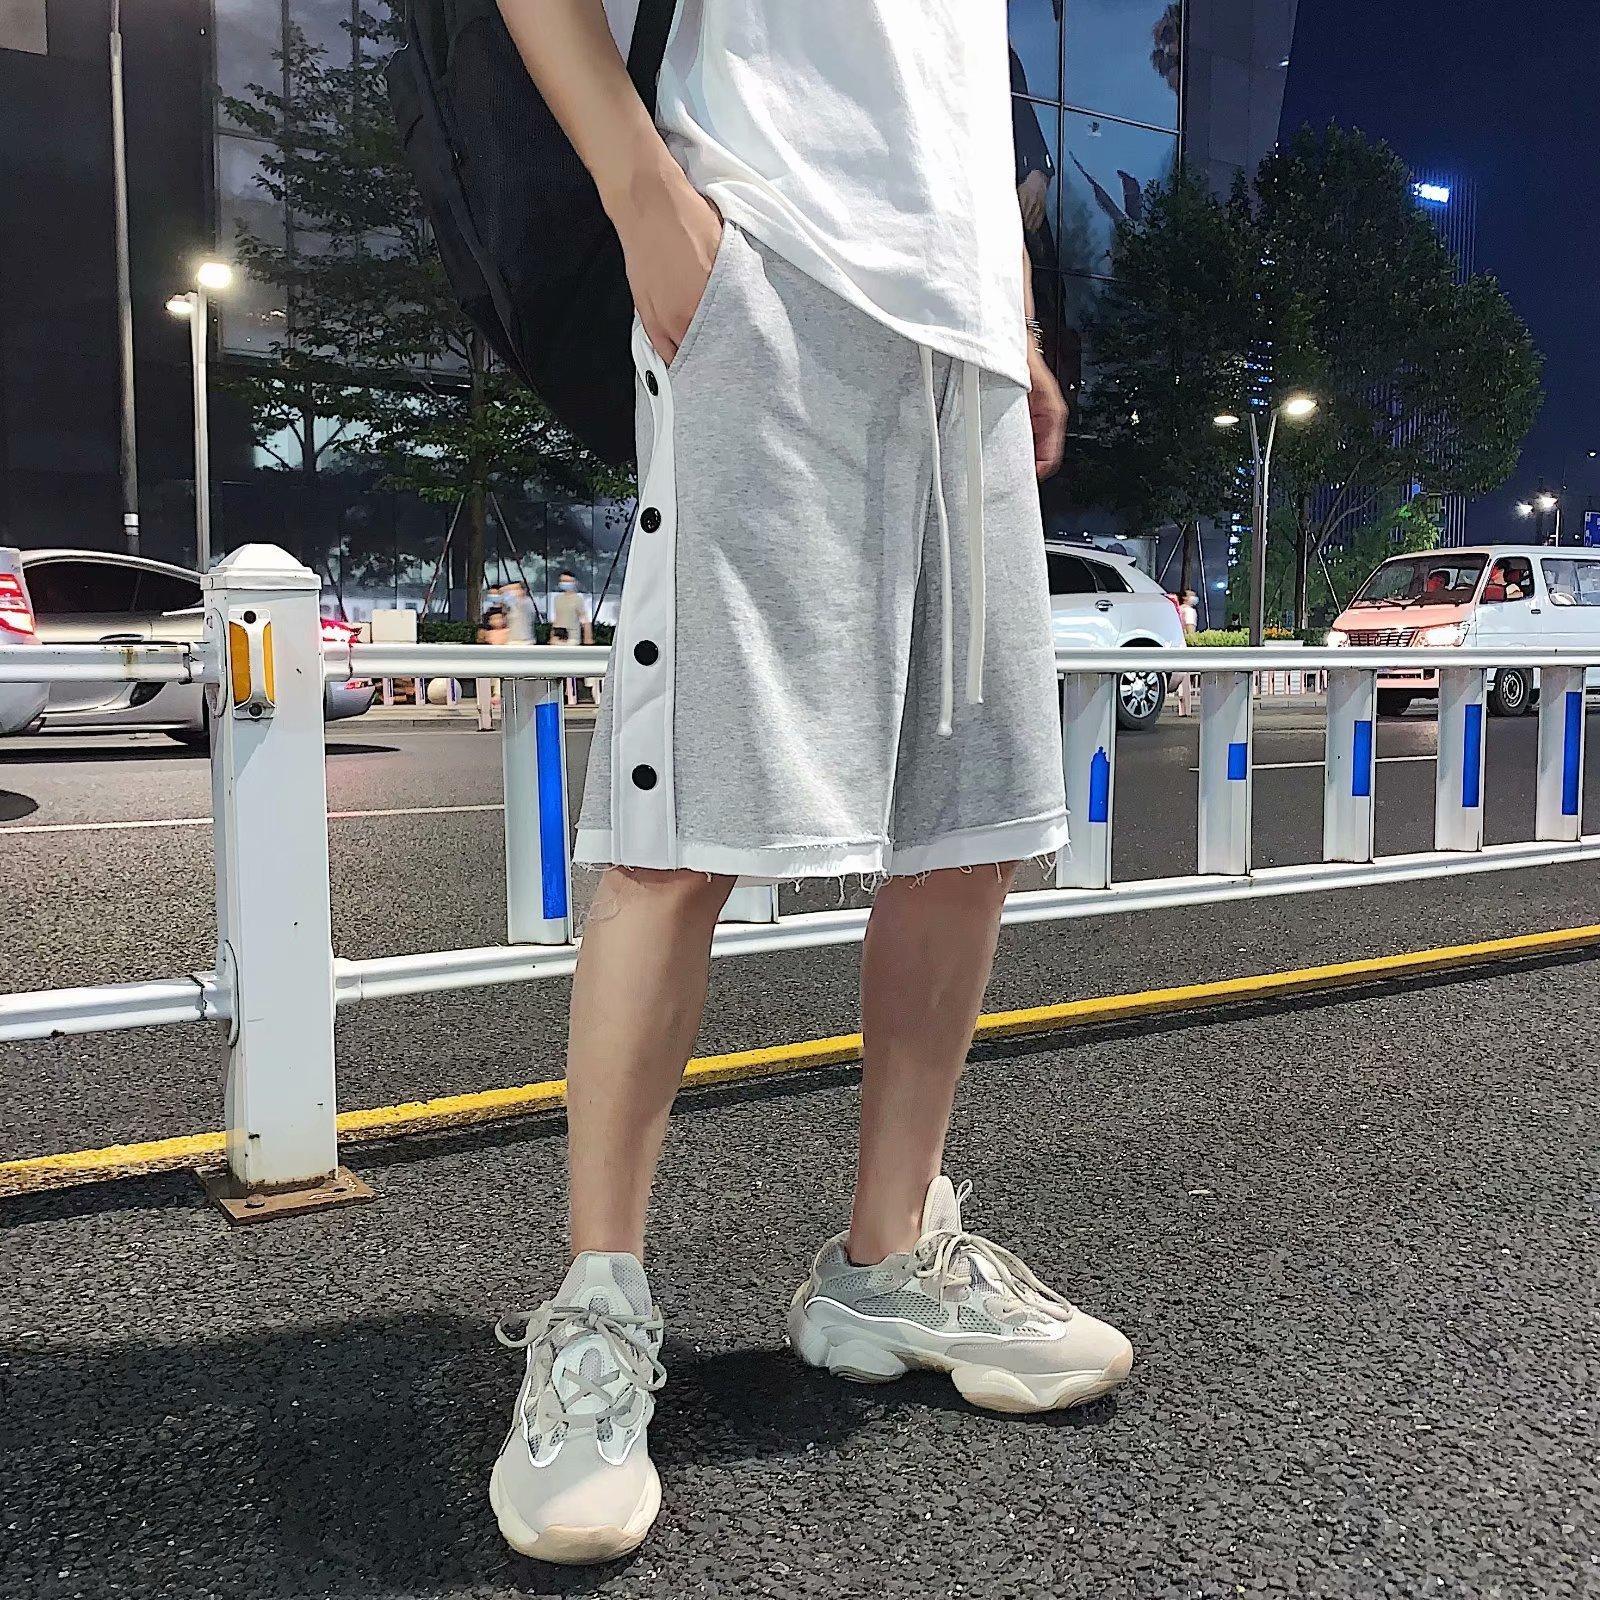 Großhandel 2021 Angst vor Gott Herren Kurze Hosen Mode Herren Casual Hosen Essentials Sommer Shorts Hohe Qualität Casual Shorts